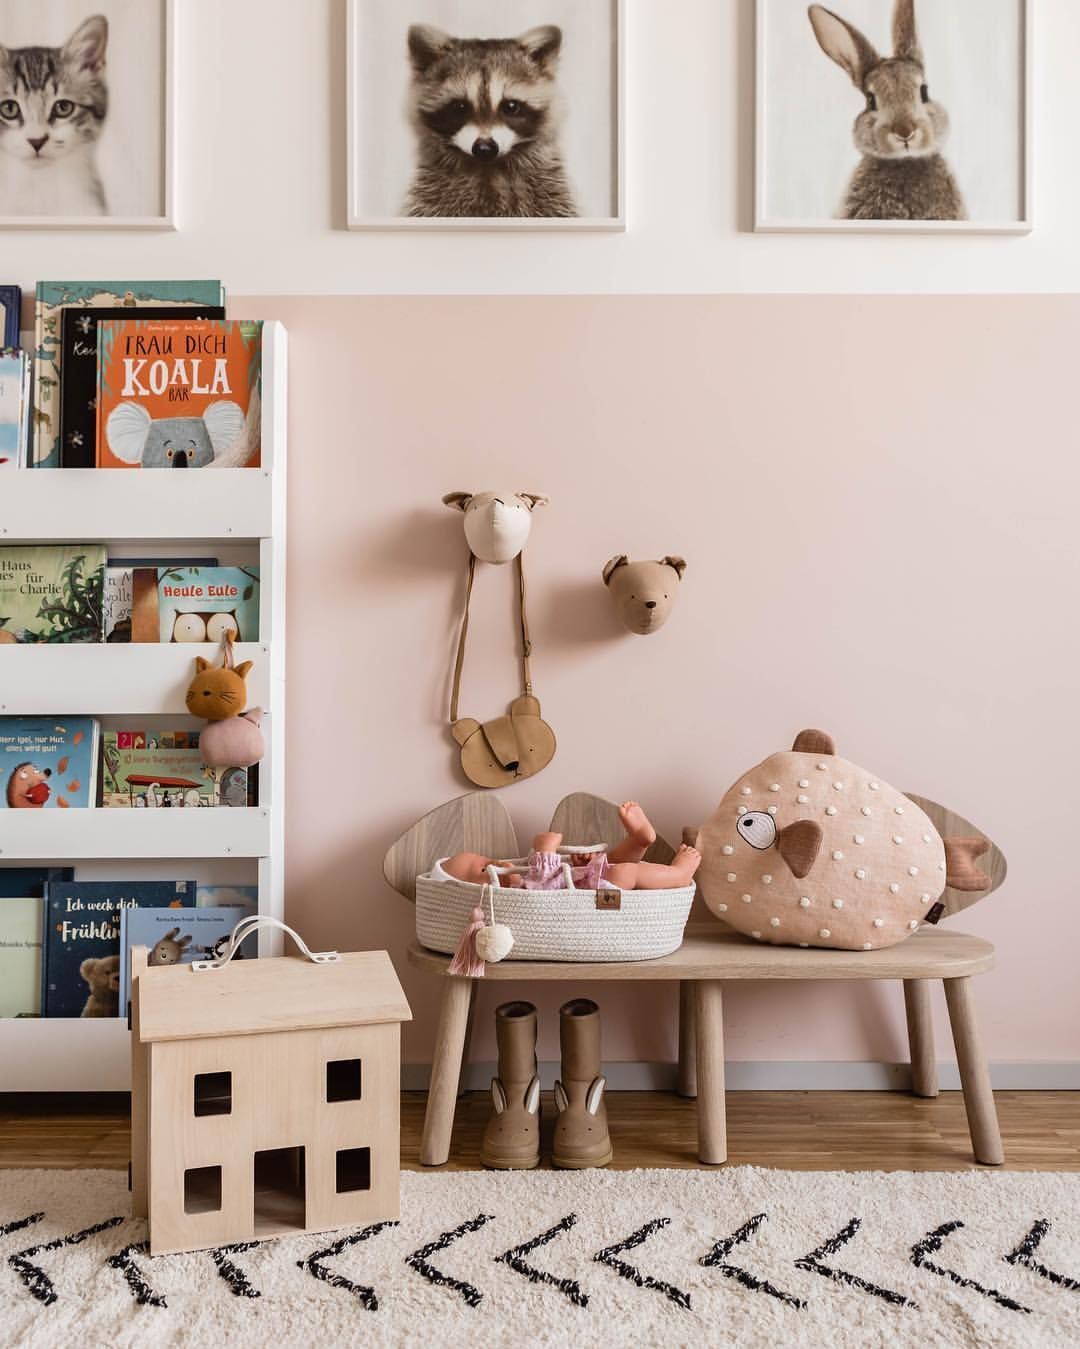 Vintage mädchen zimmer dekor kinderkram im kinderzimmer  repost miniundstil kinderzimmer